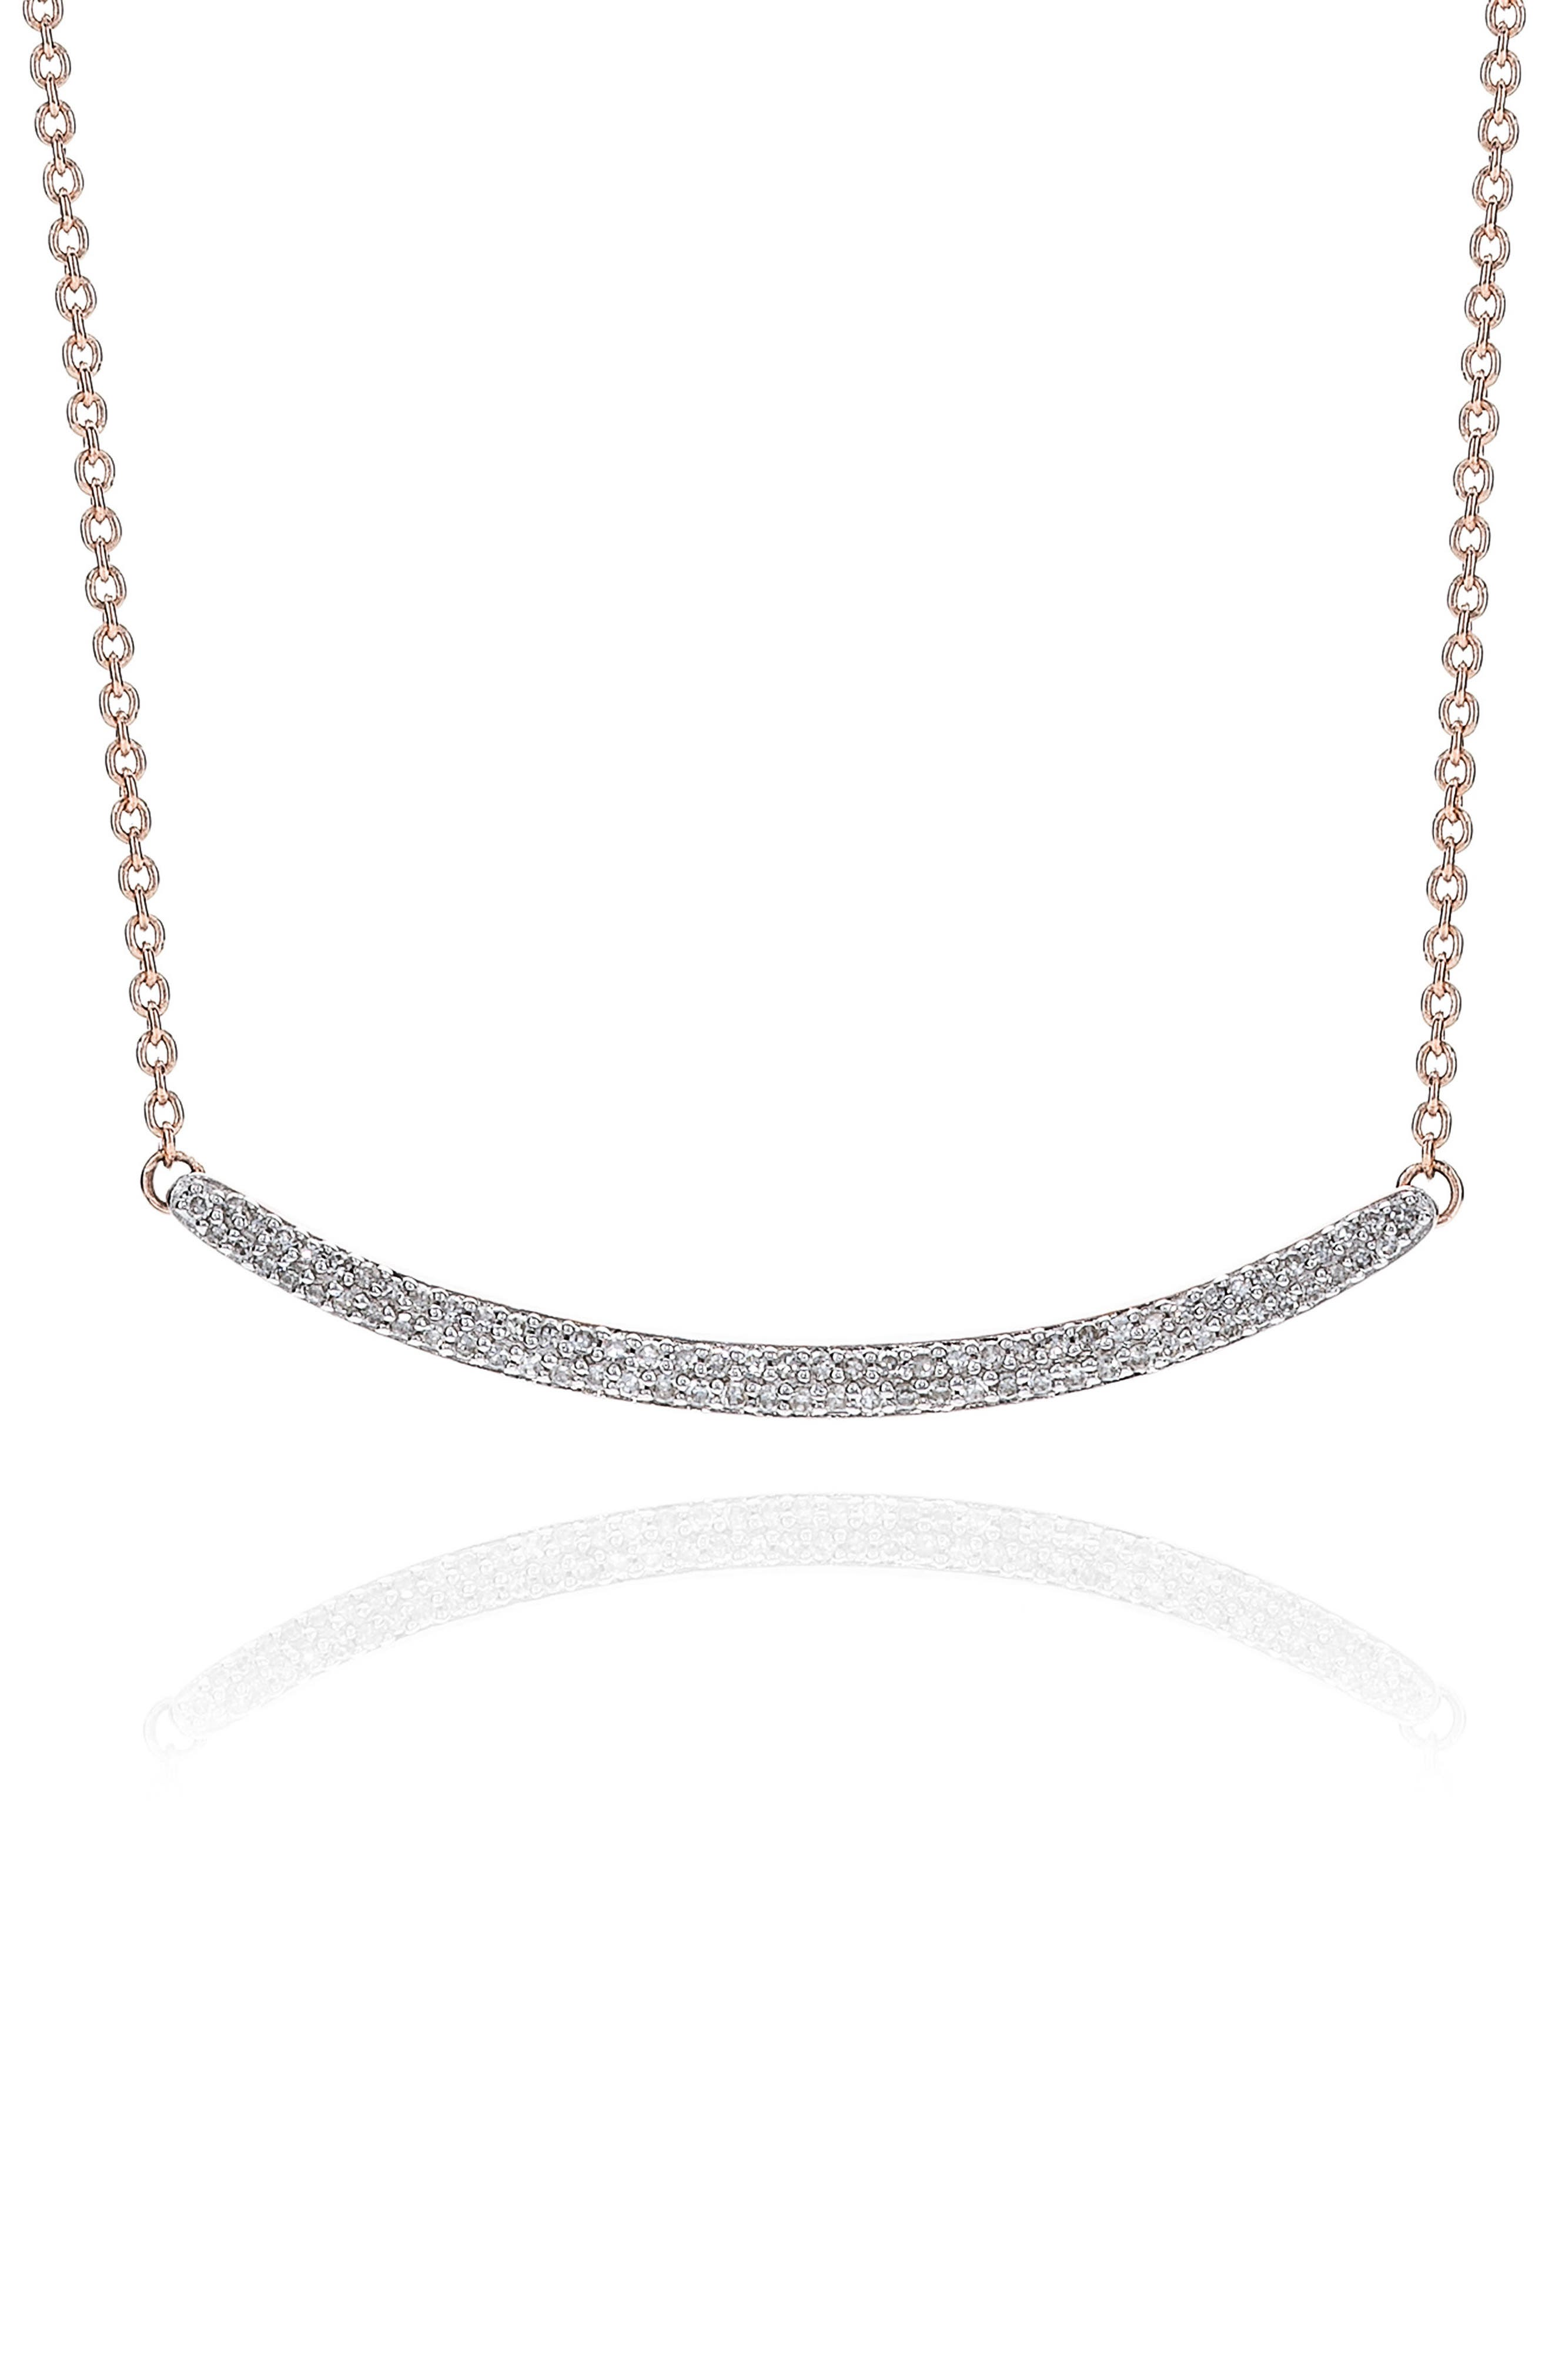 MONICA VINADER, Skinny Diamond Necklace, Alternate thumbnail 2, color, ROSE GOLD